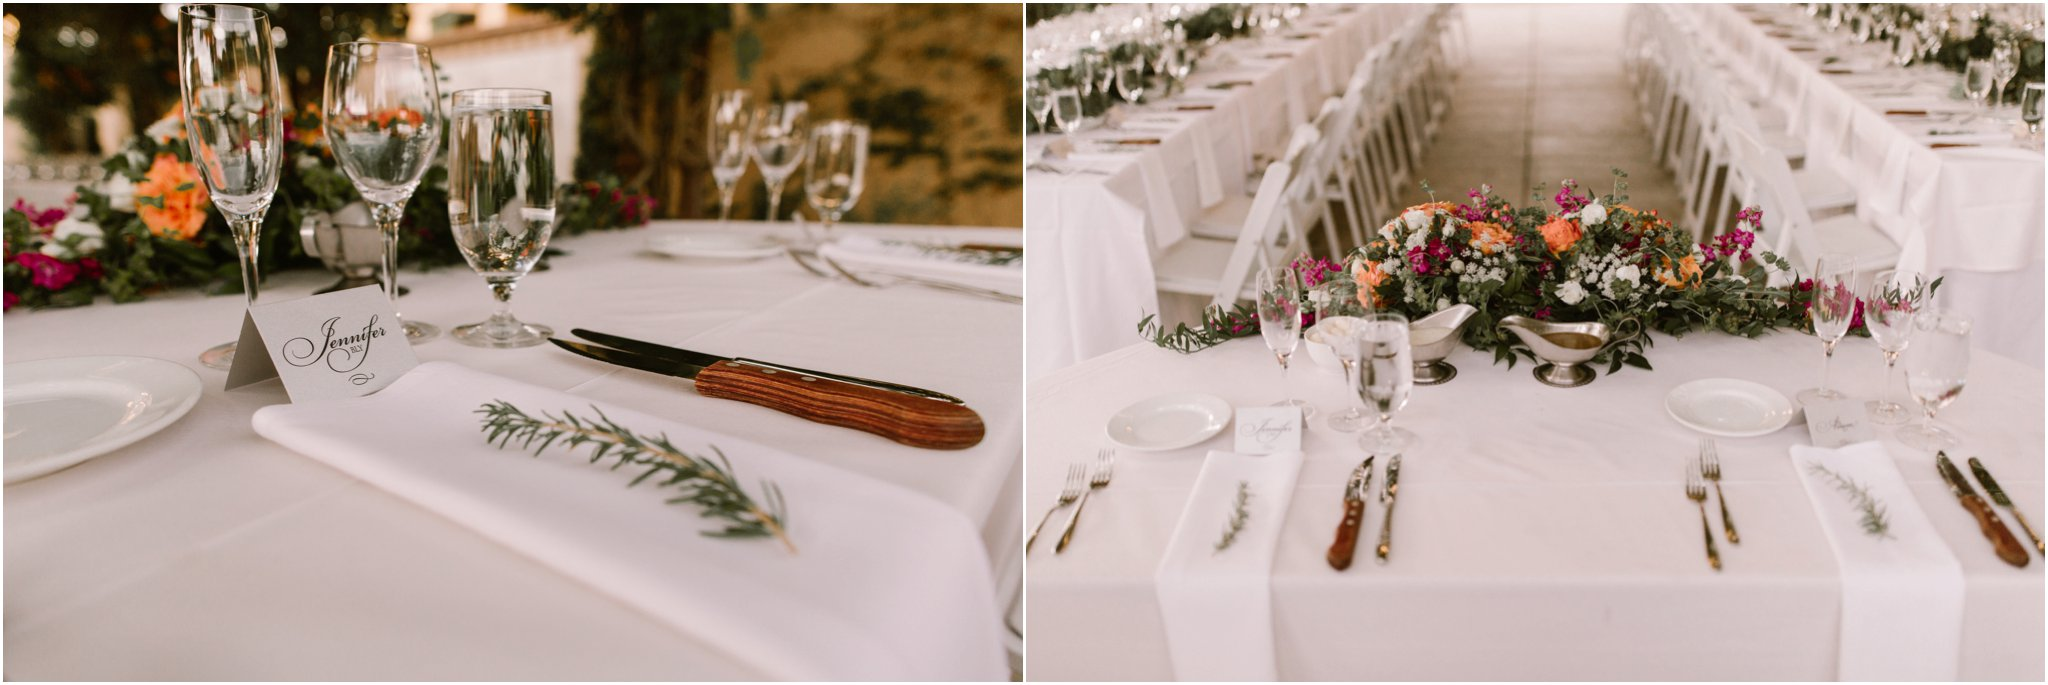 0033Hotel Albuquerque Wedding, Inn and Spa at Loretto wedding, Santa Fe wedding photographers, blue rose photography